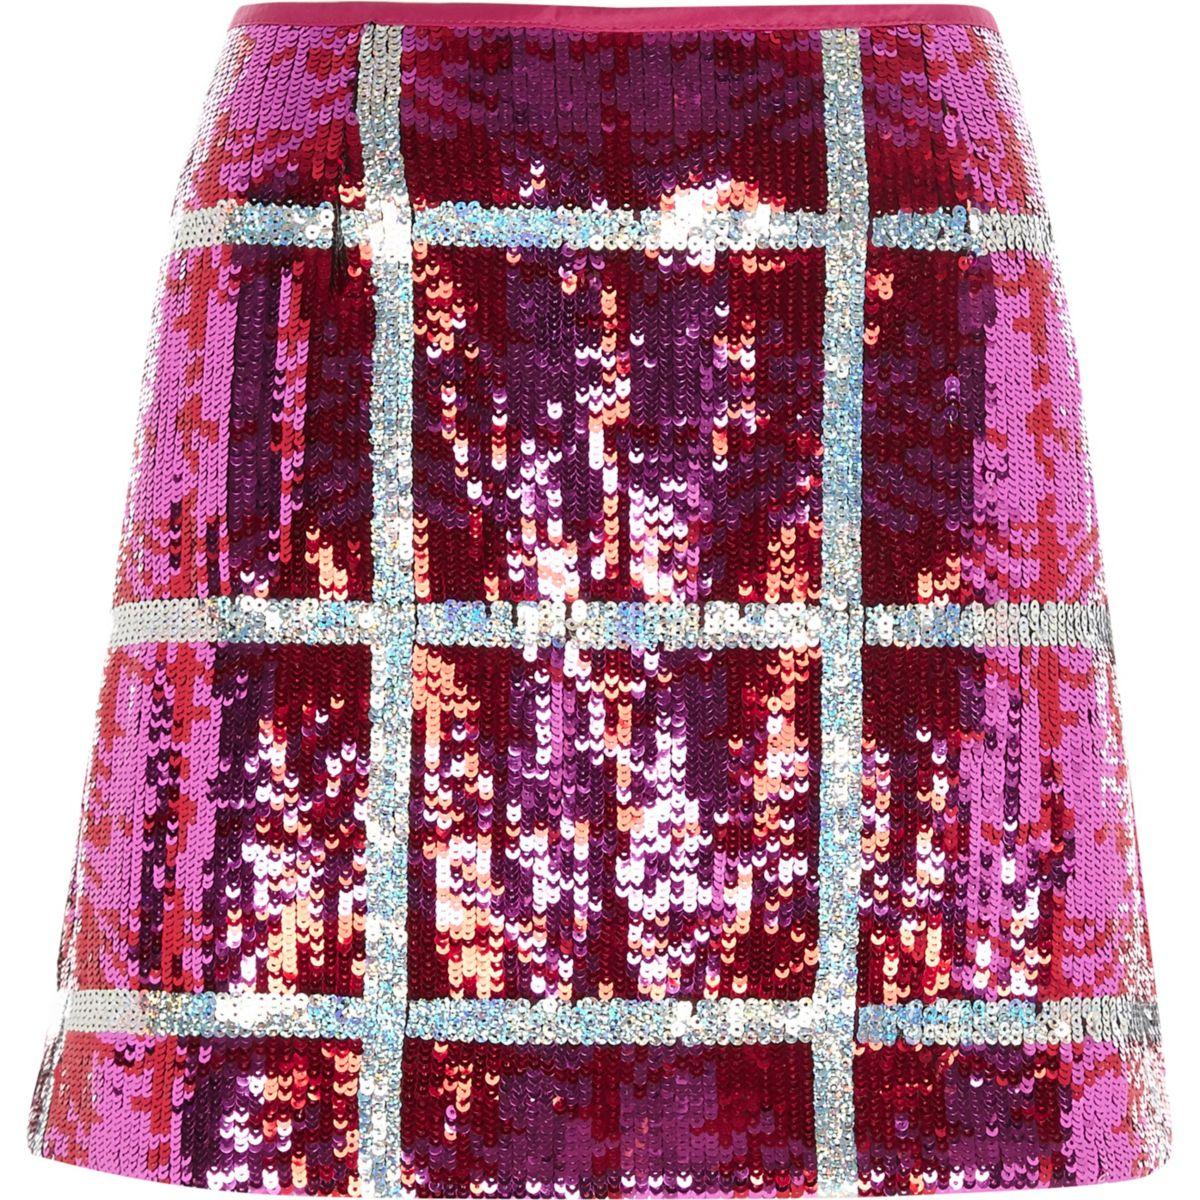 Bright pink sequin check mini skirt